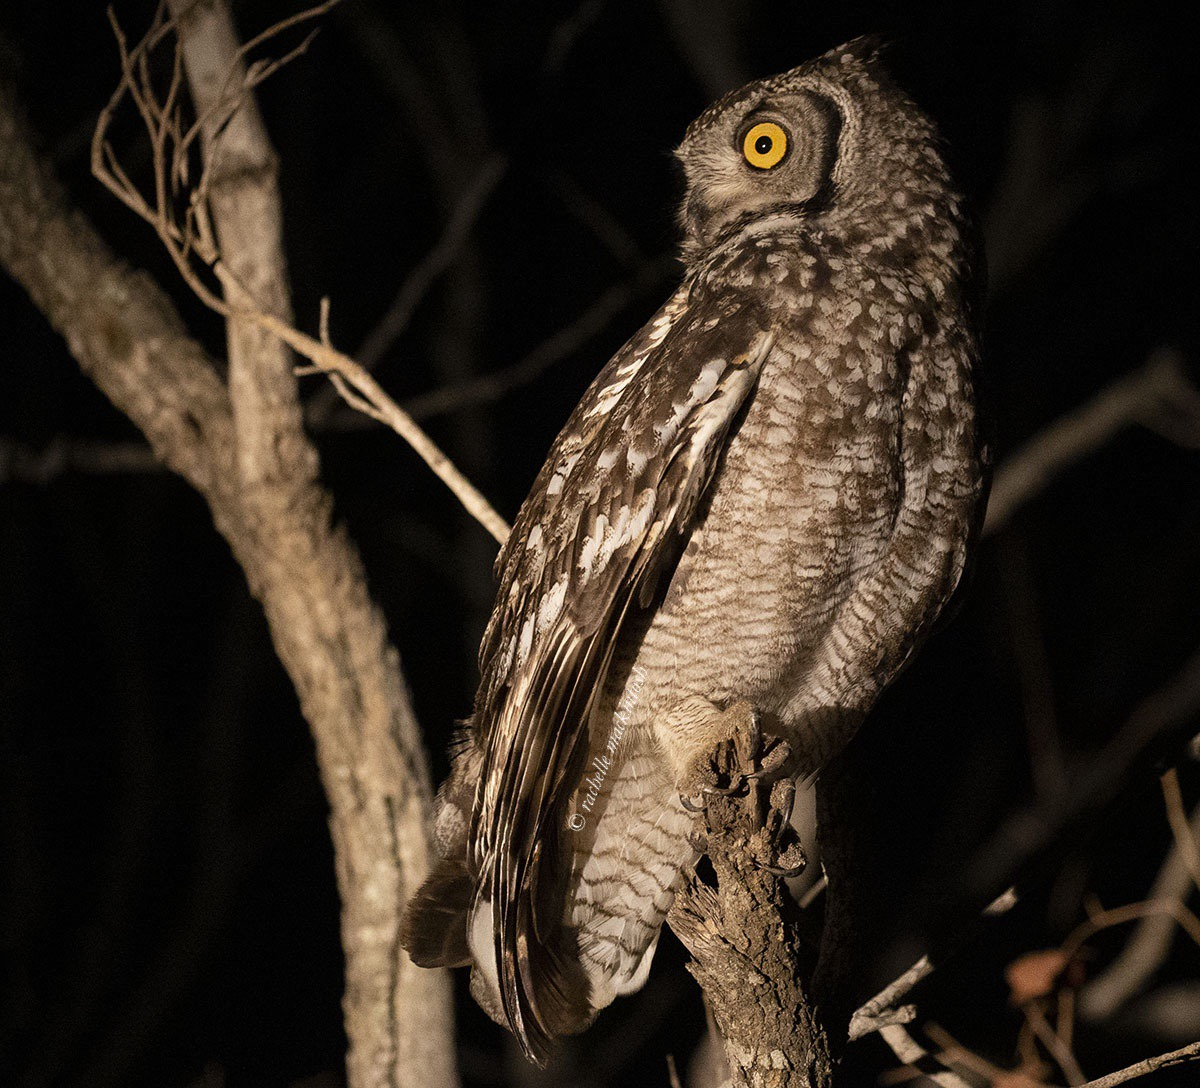 African eagle owl, Kapama, South Africa